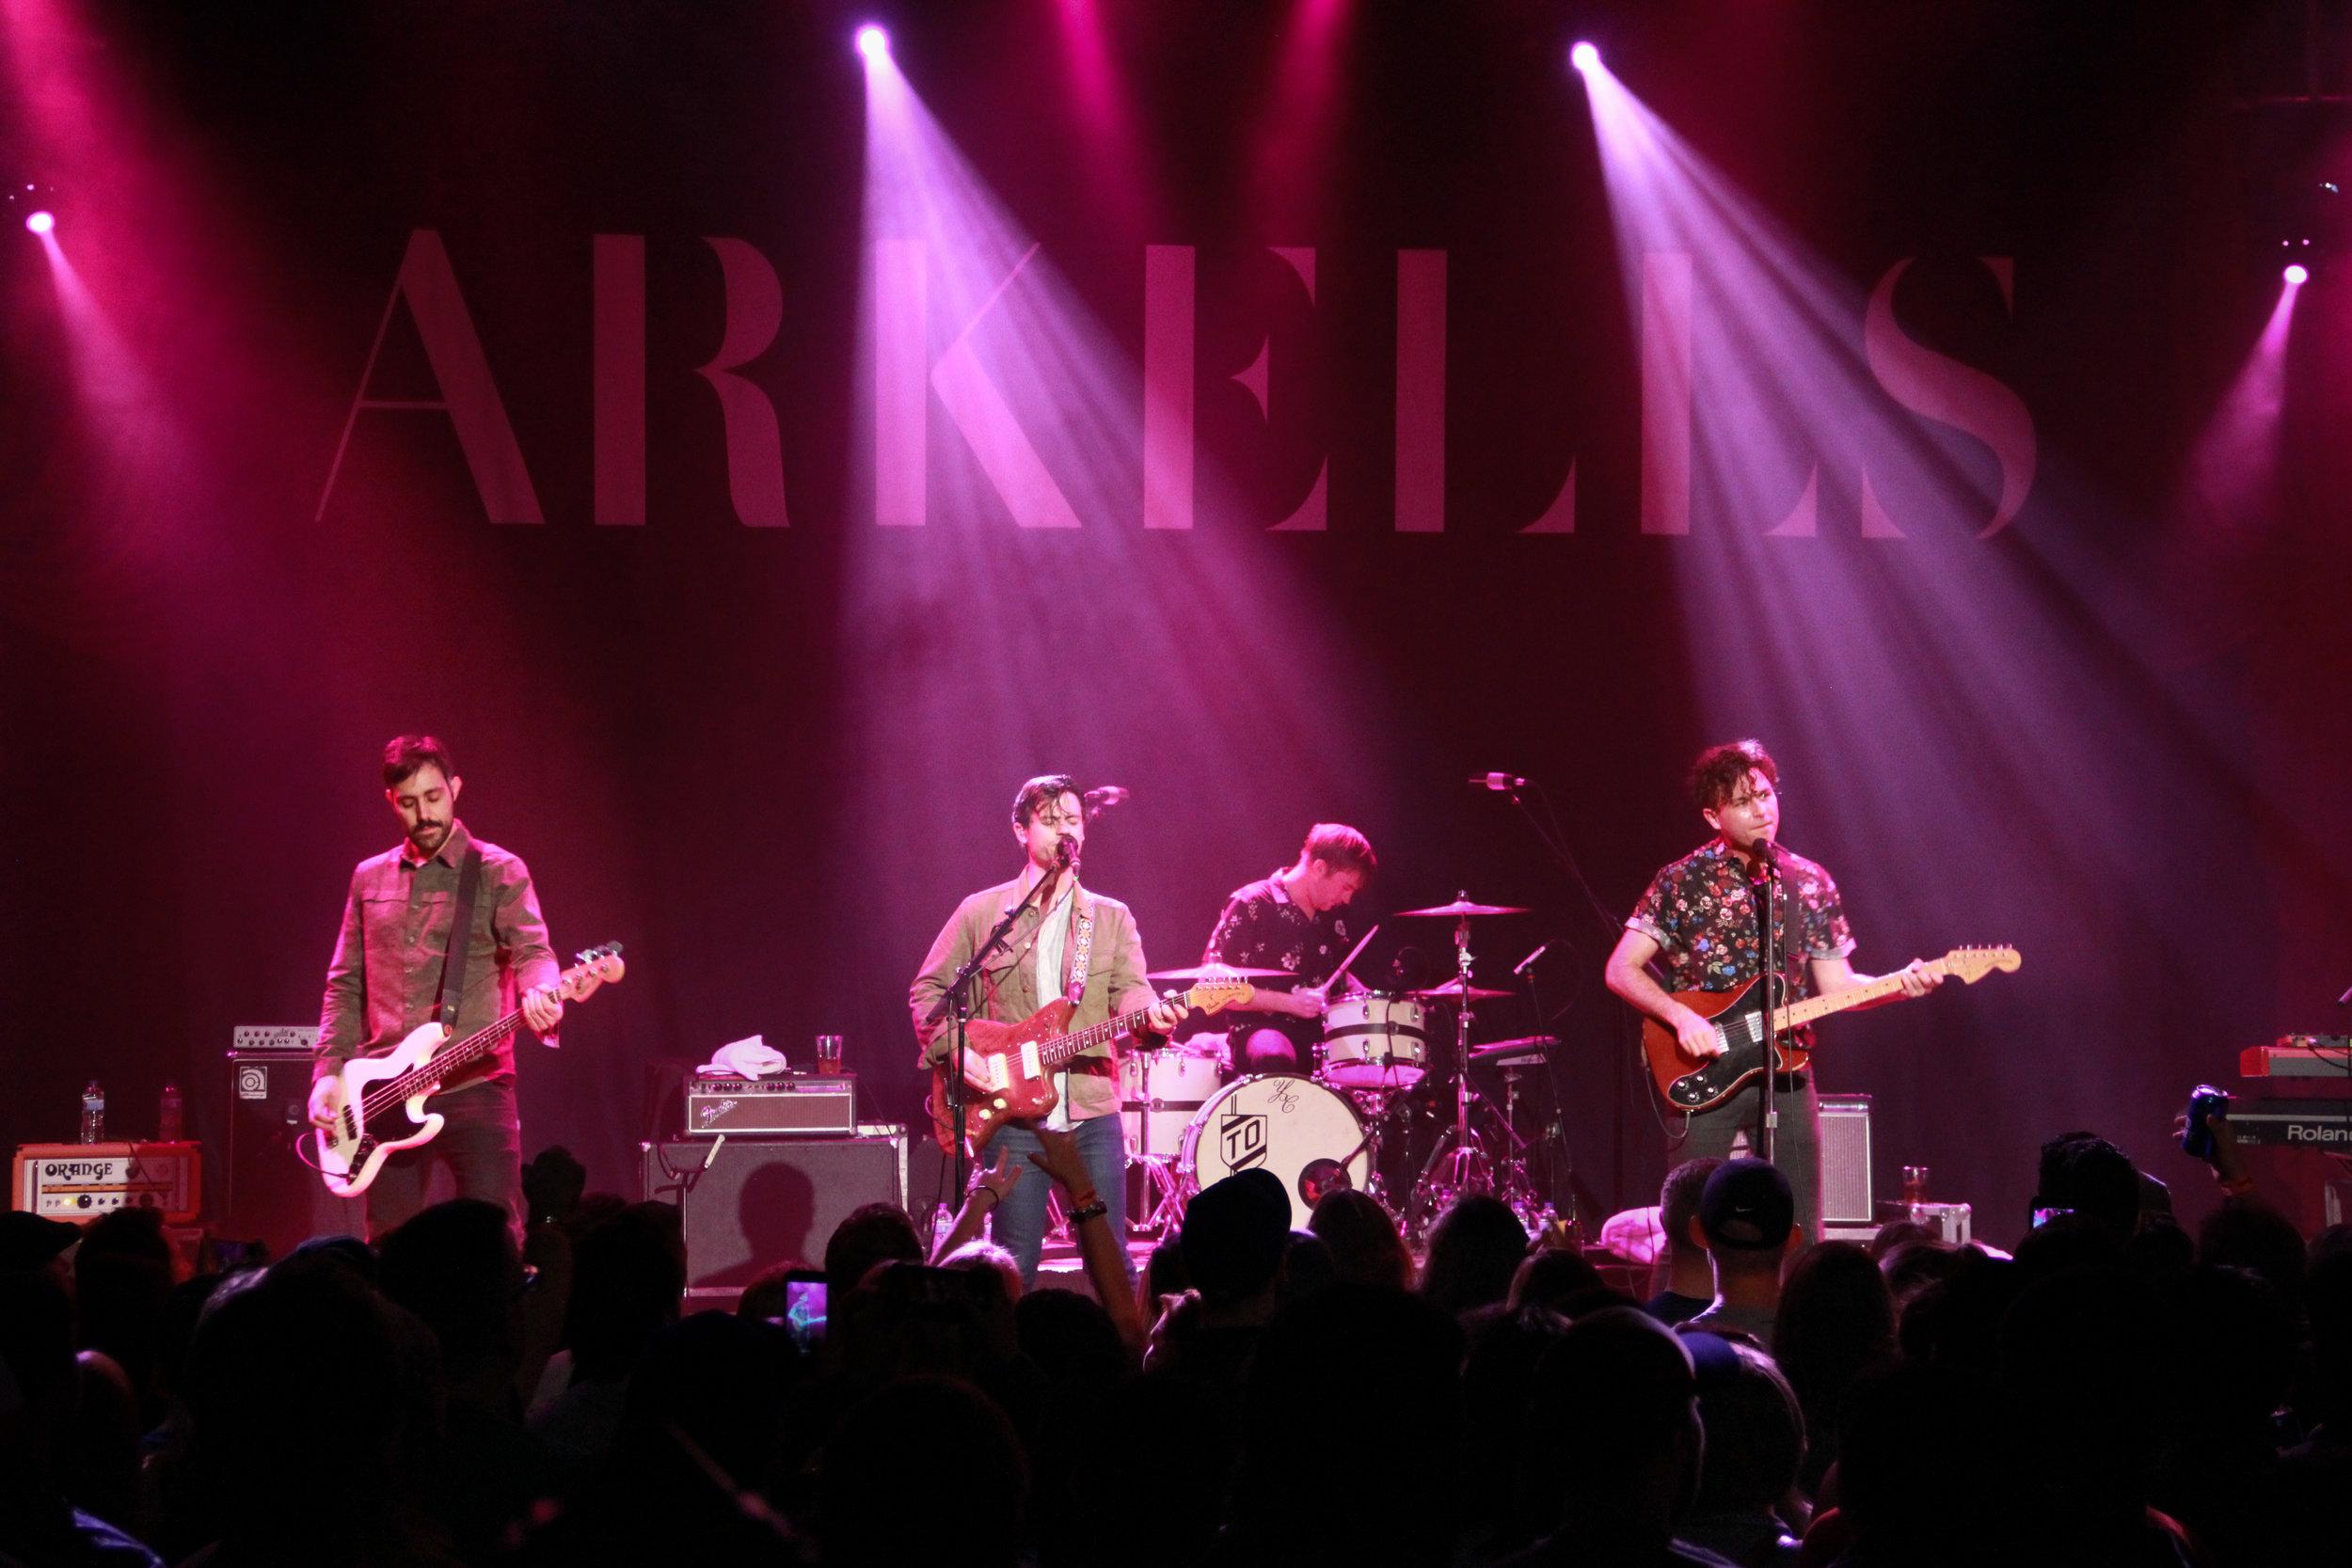 ARKELLS (06-10-27) HOB Chicago-38.jpg